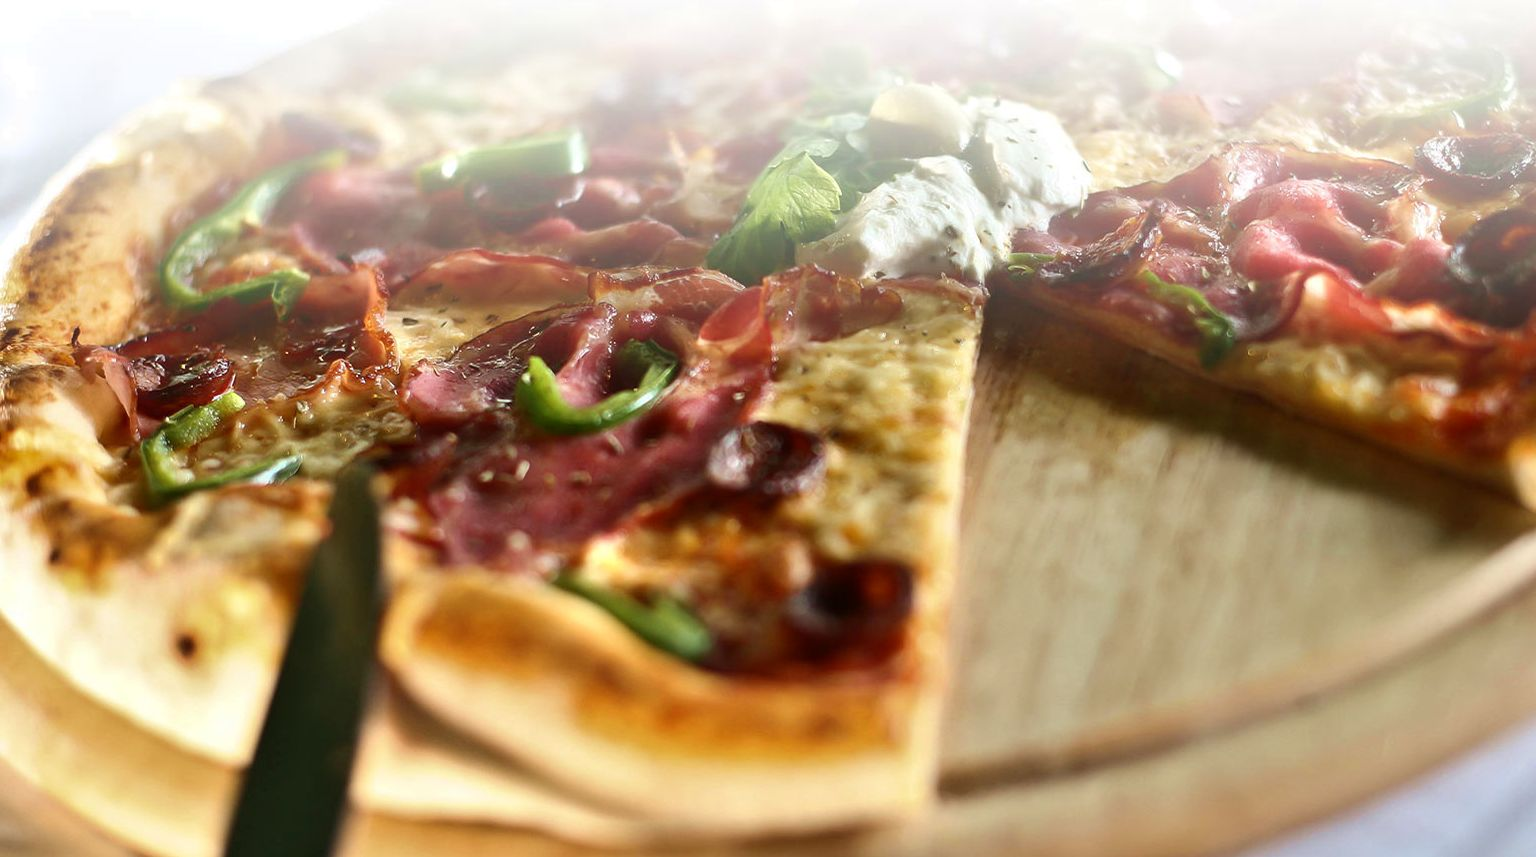 Pizzeria Lipov hlad (photo credit: lipov-hlad.hr)